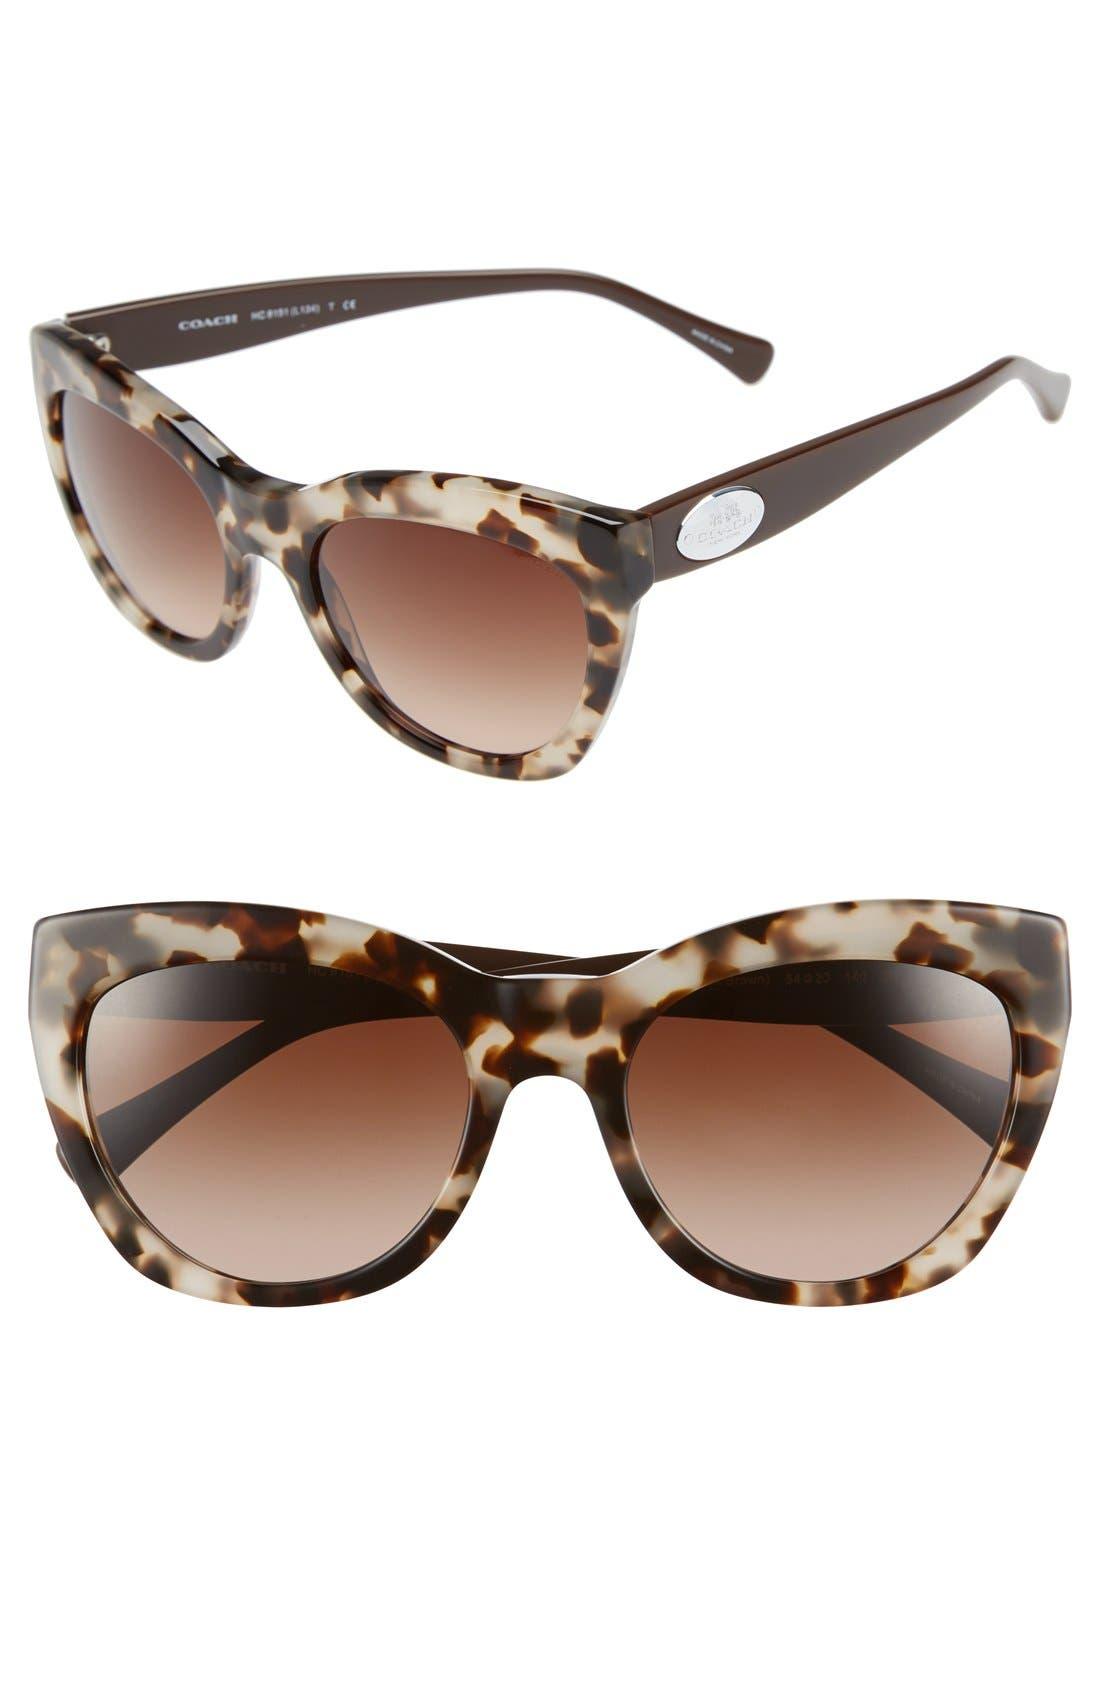 54mm Retro Sunglasses,                         Main,                         color, Light Tortoise